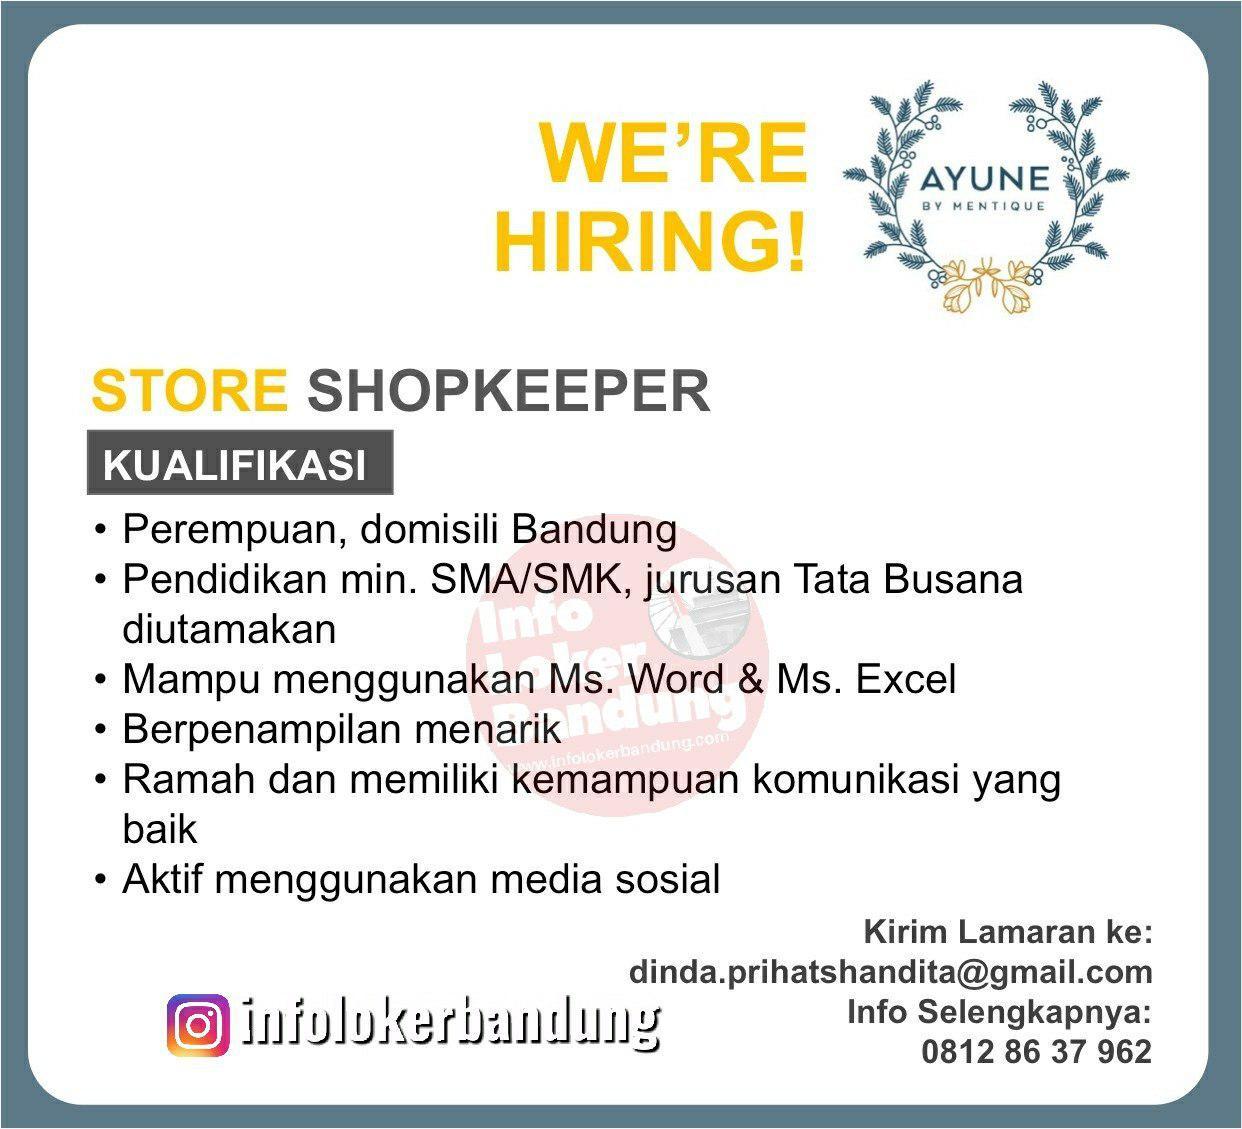 Lowongan Kerja Store Shopkeeper Ayune by Mentique Boutique Bandung April 2019